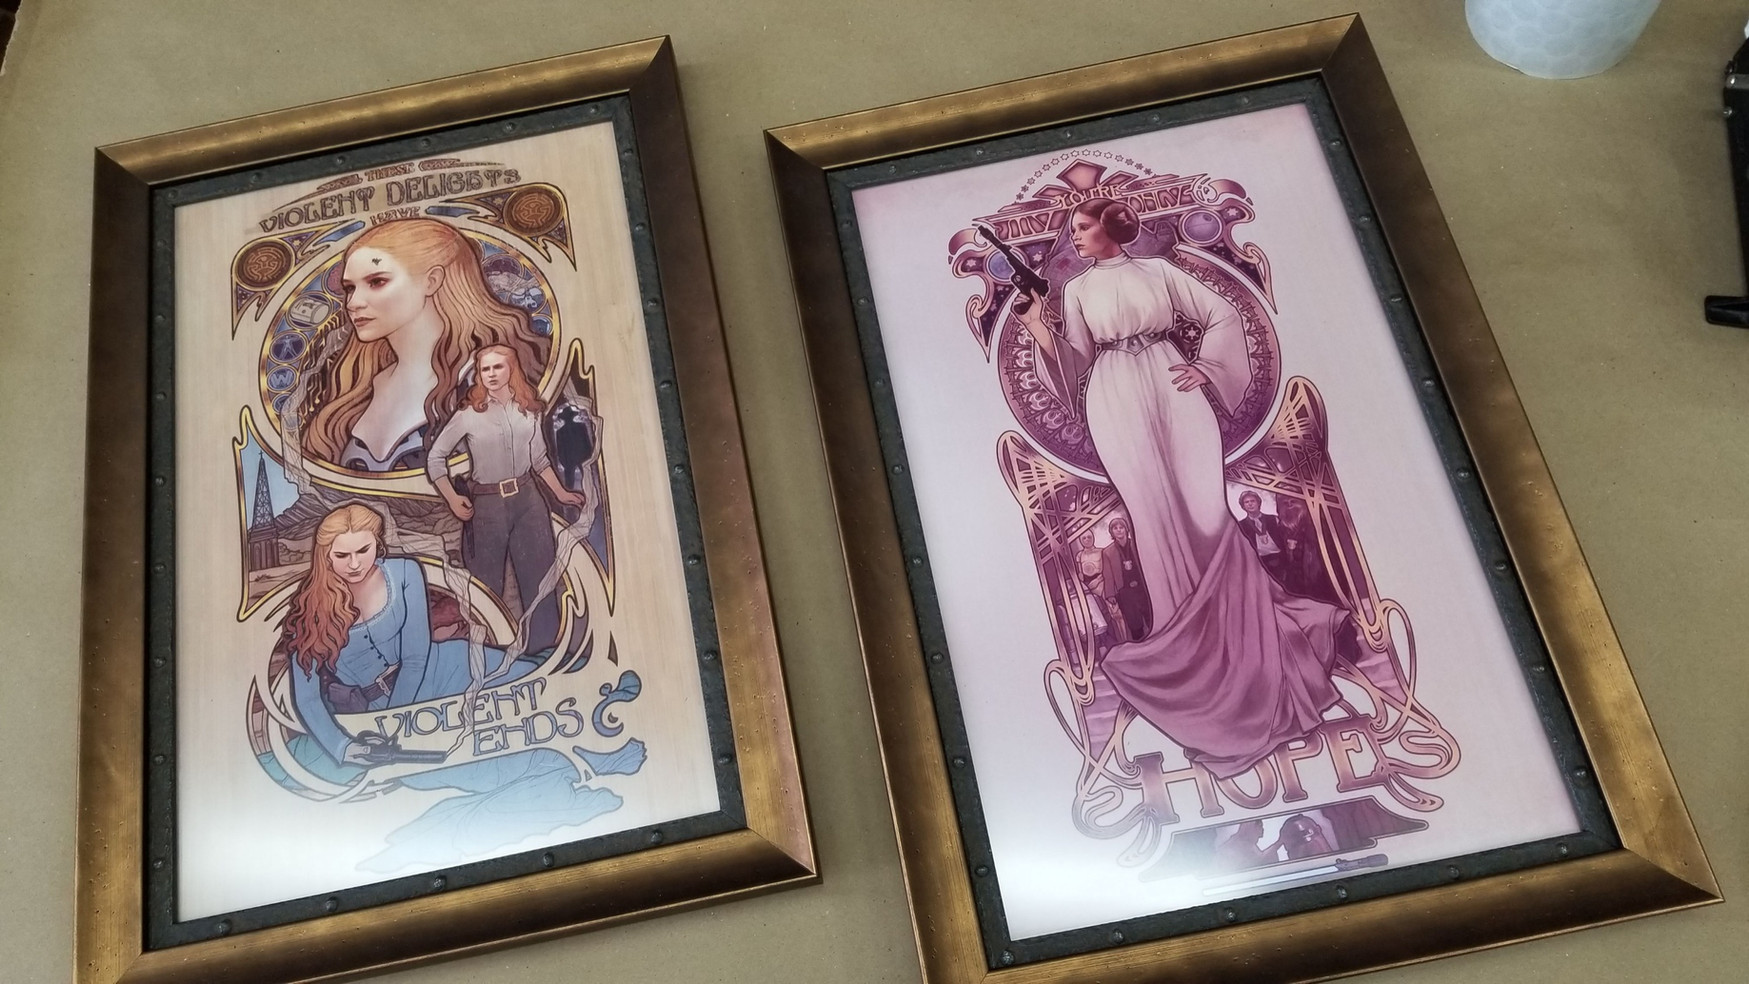 Sci-Fi/Steampunk posters